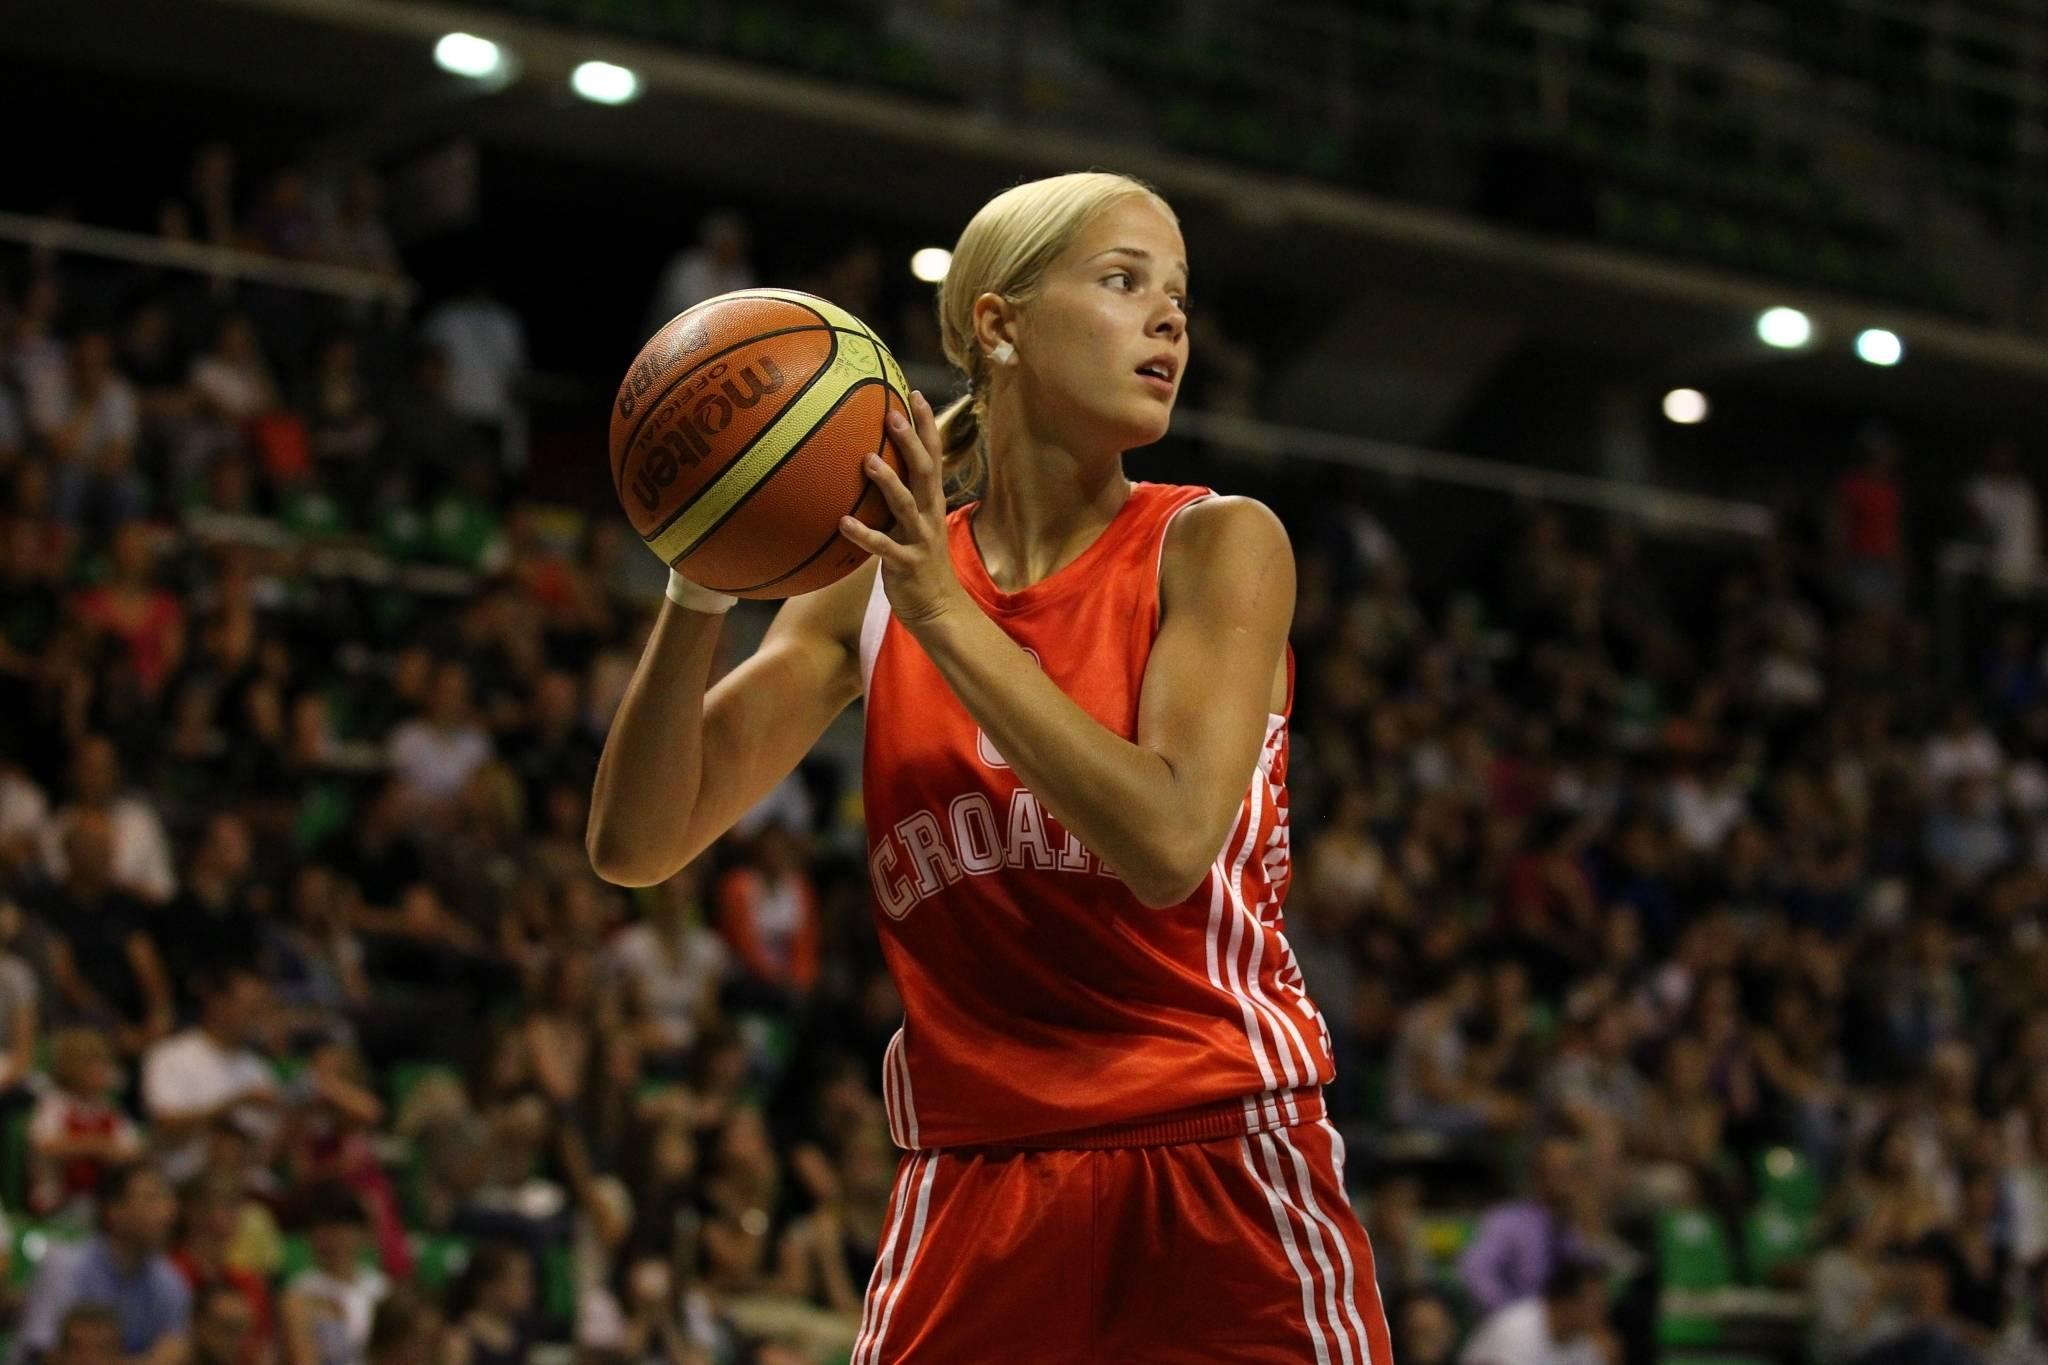 omens basketball girl - HD1200×800